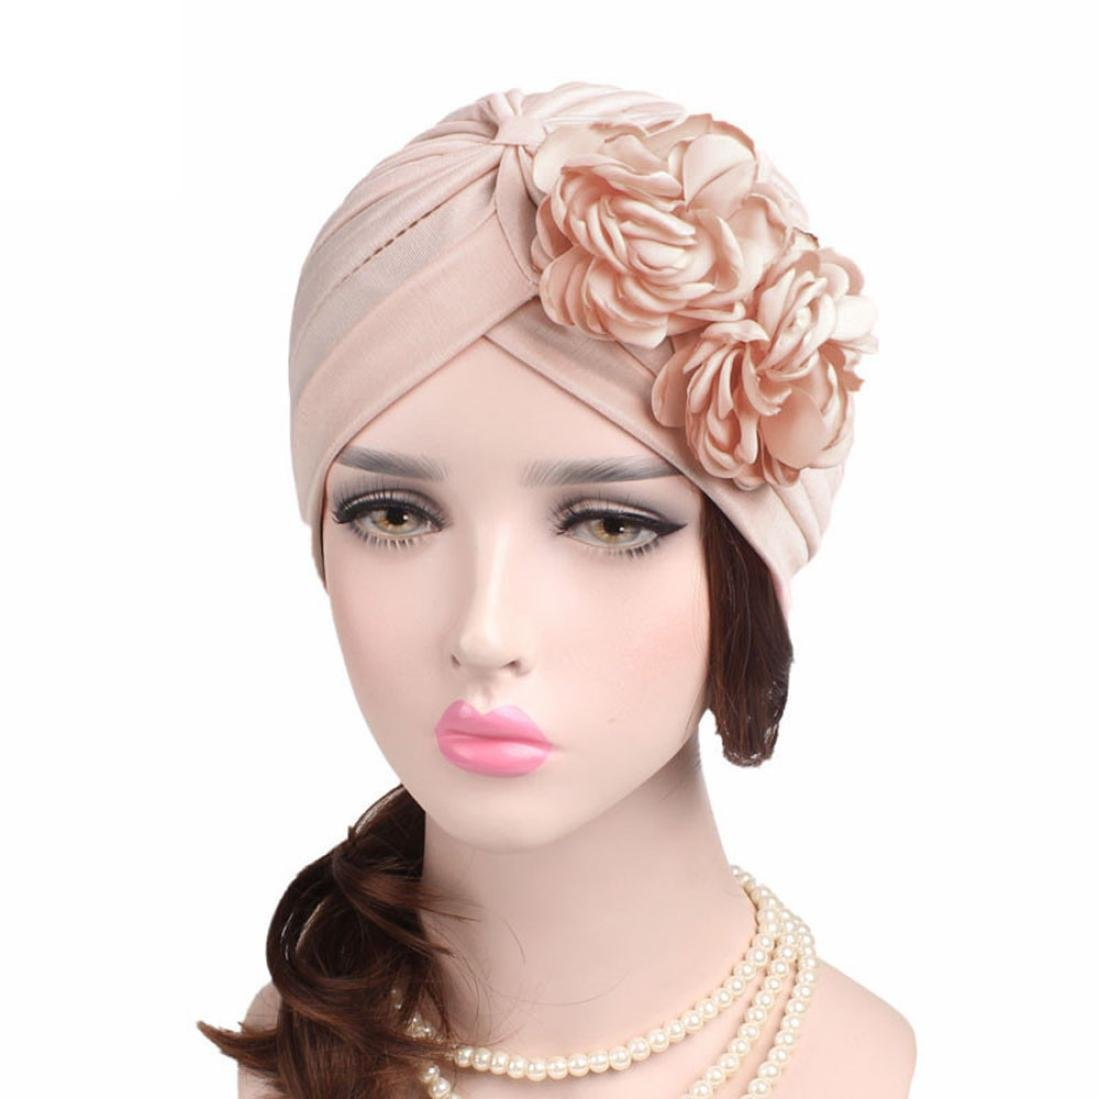 QingFan Women Muslim Solid Flowers Cancer Chemo Hat Turban Headbands Hair Loss Wrap Cap (Beige)